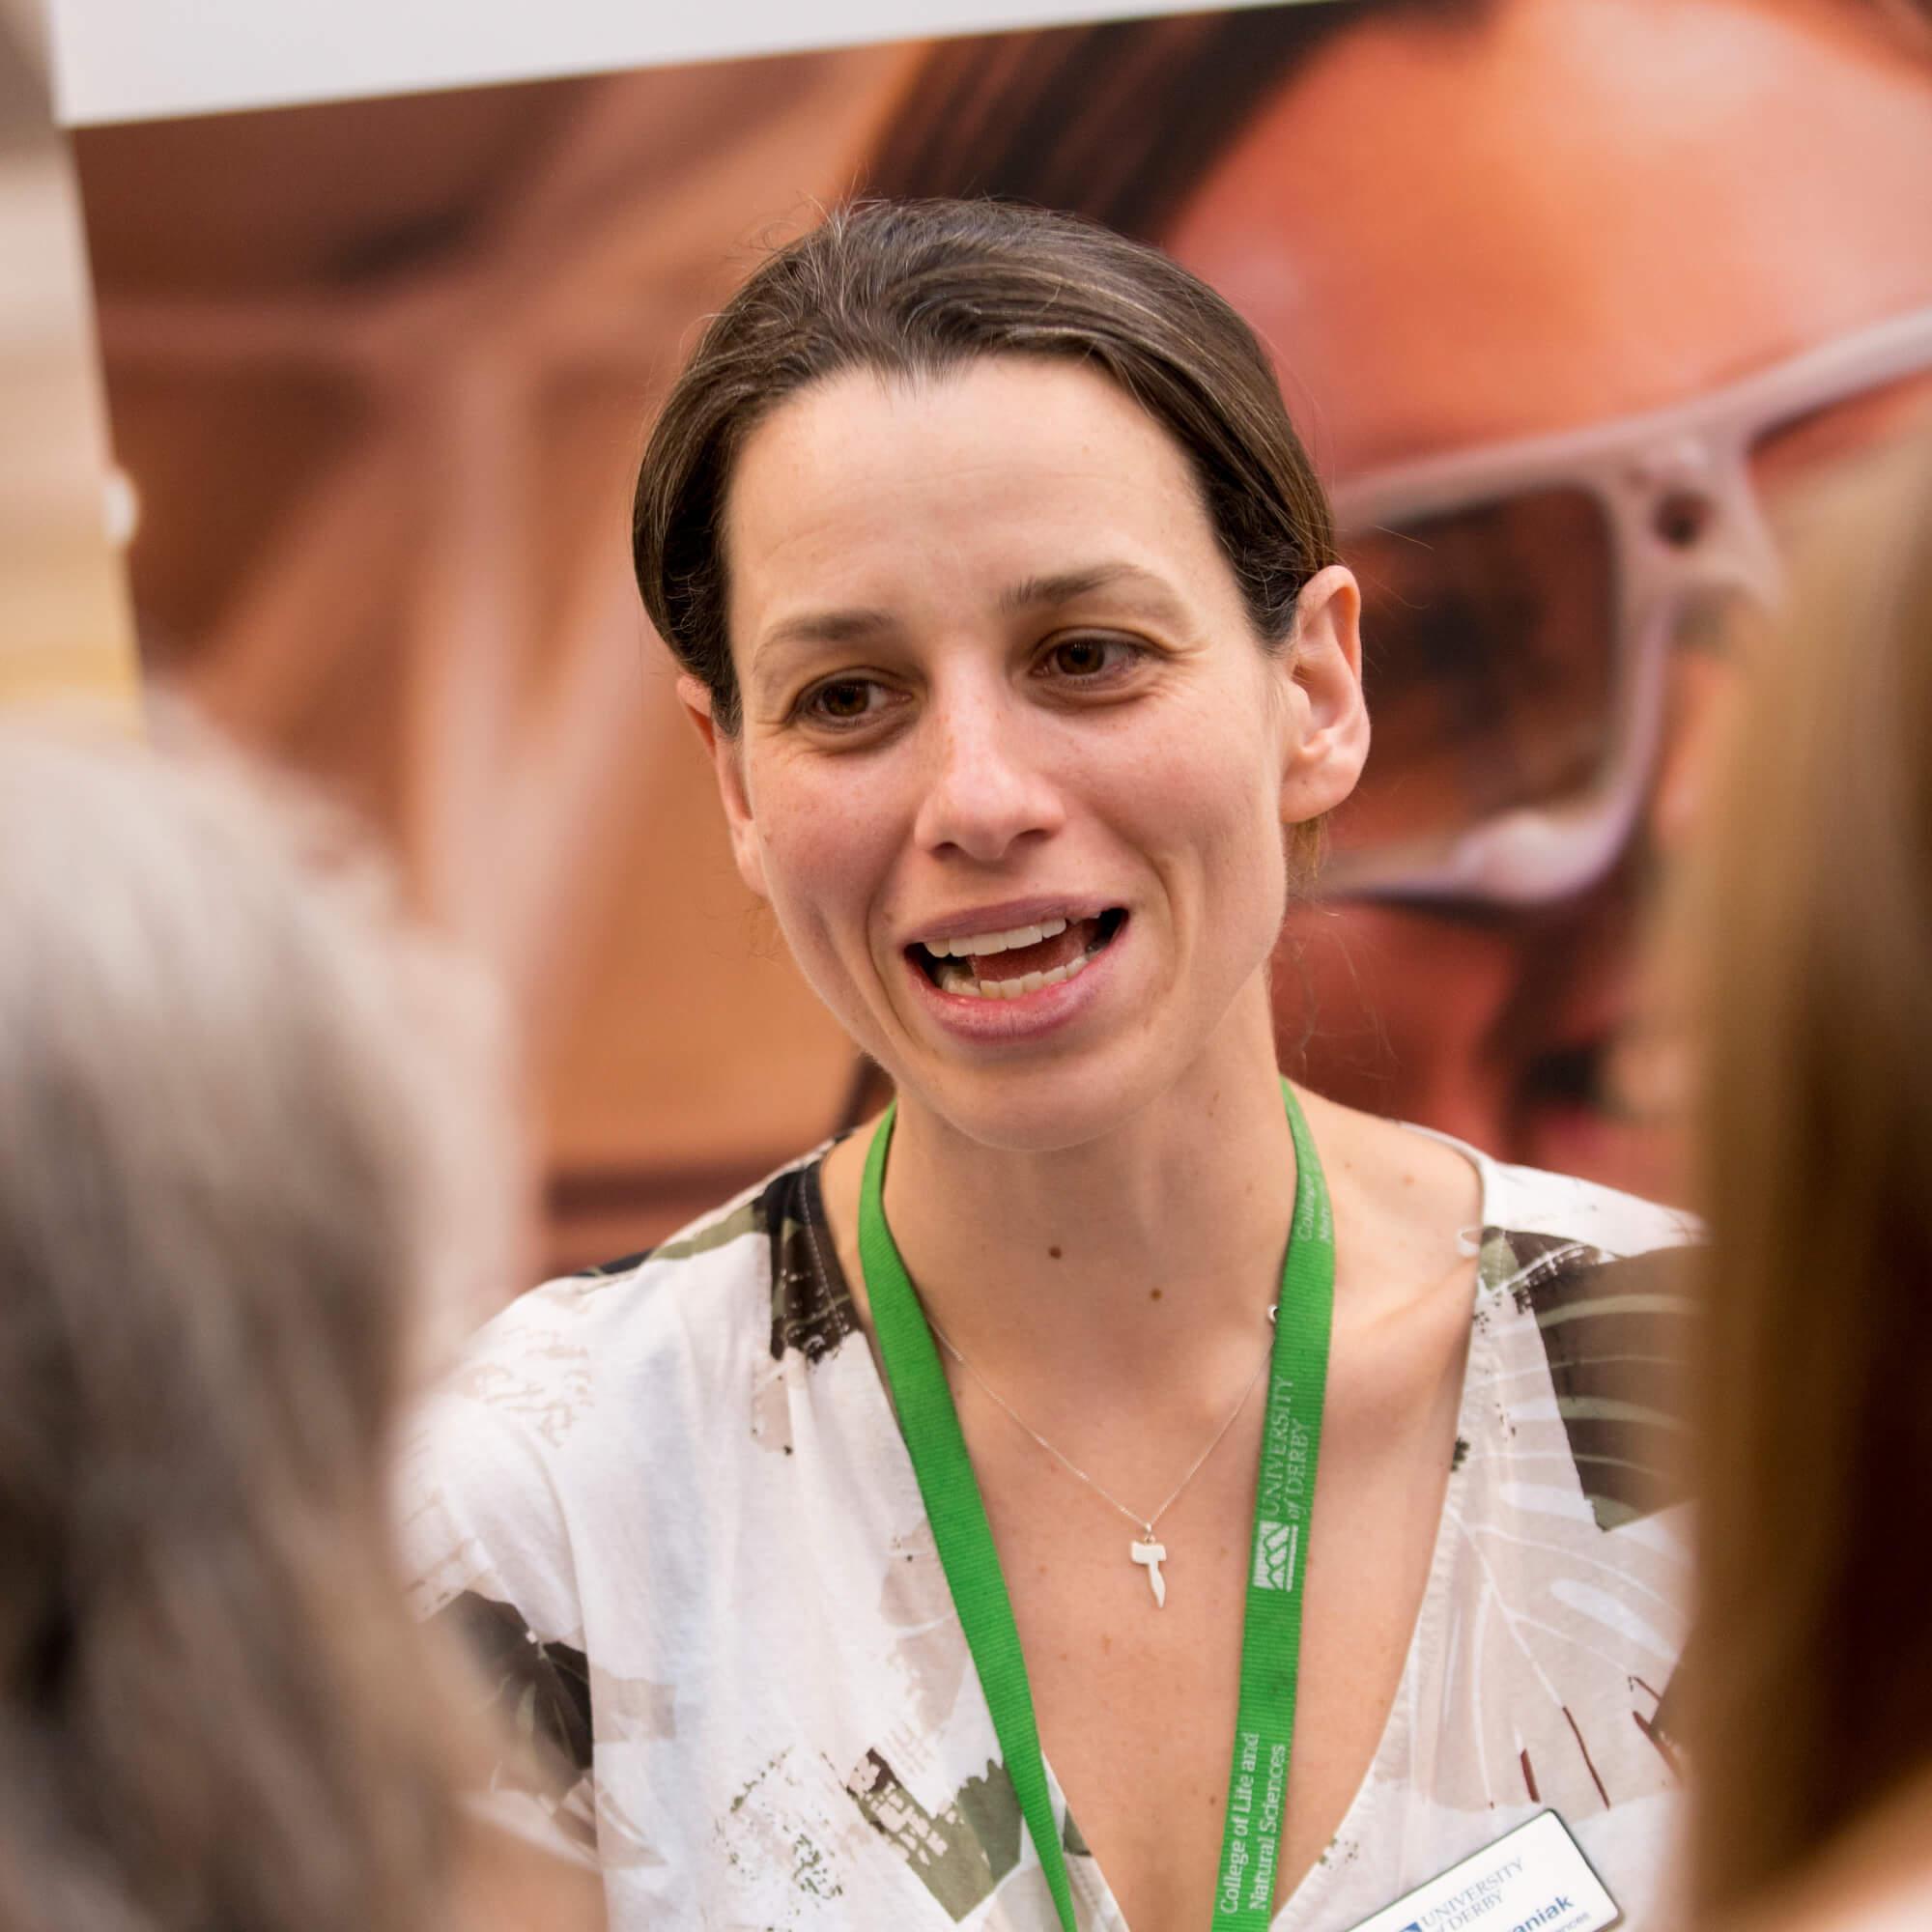 Dr Amy Baraniak